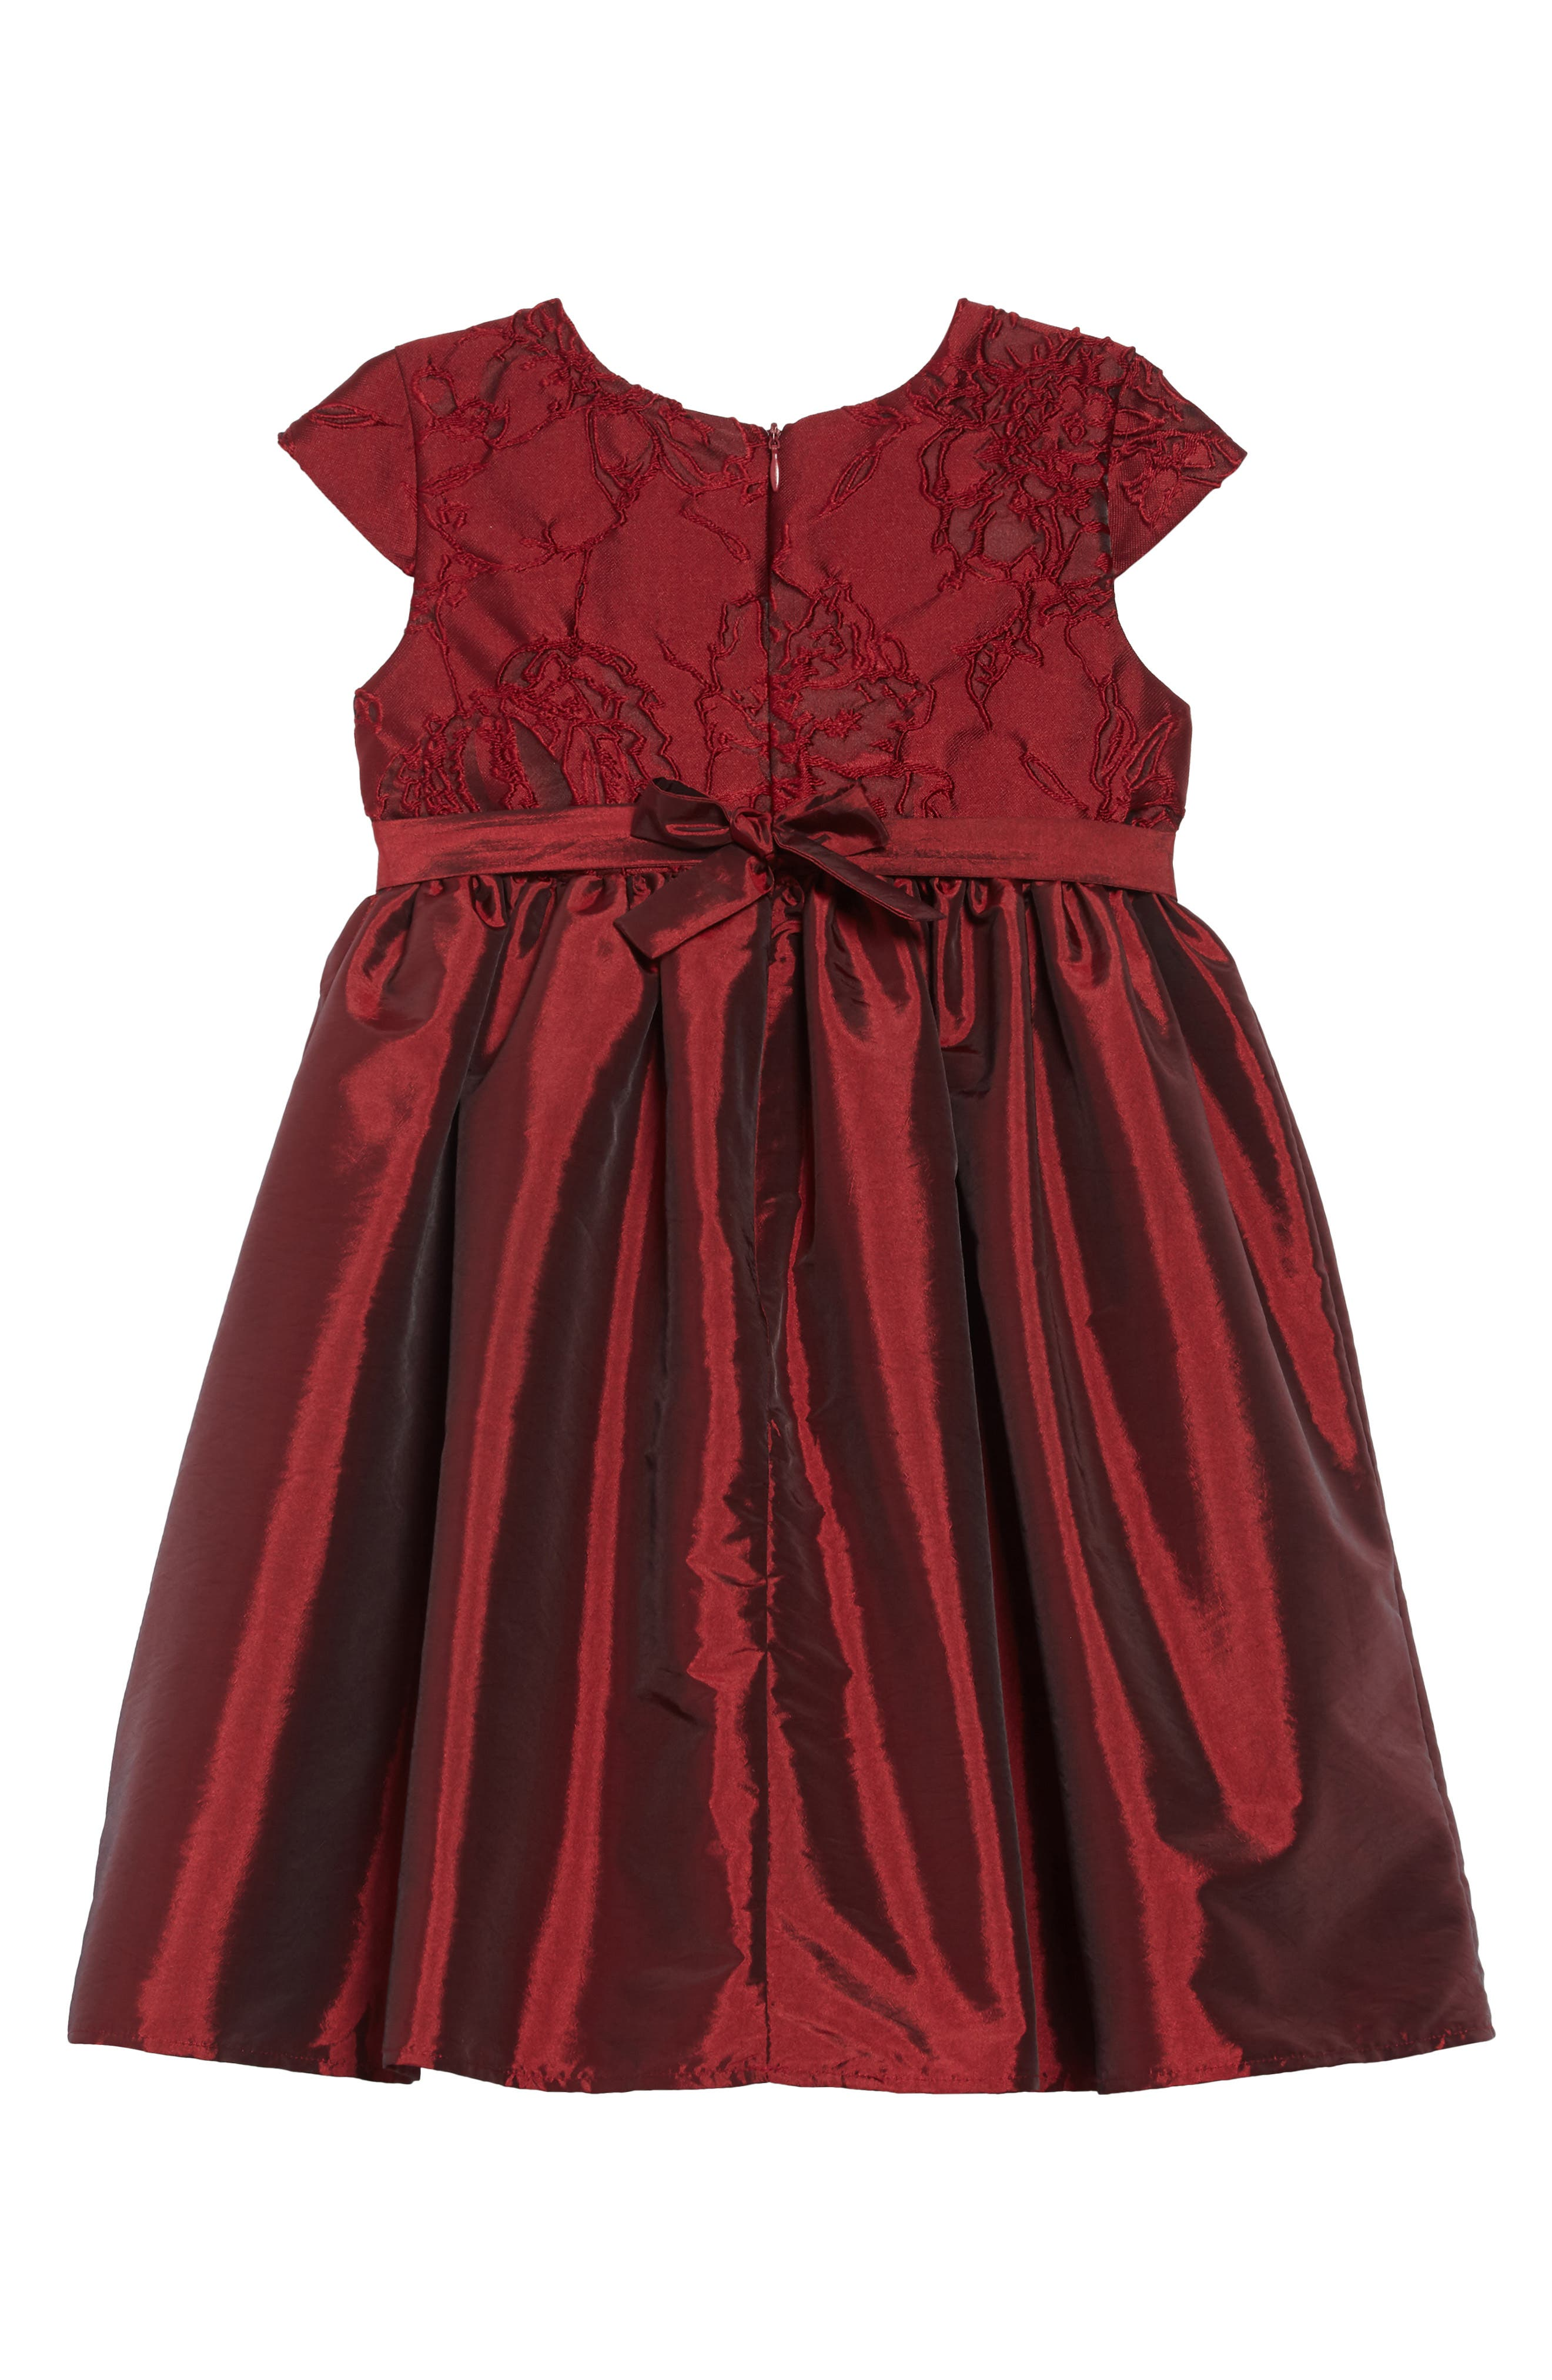 Ruby Spice Lace & Taffeta Dress,                             Alternate thumbnail 2, color,                             BURGUNDY